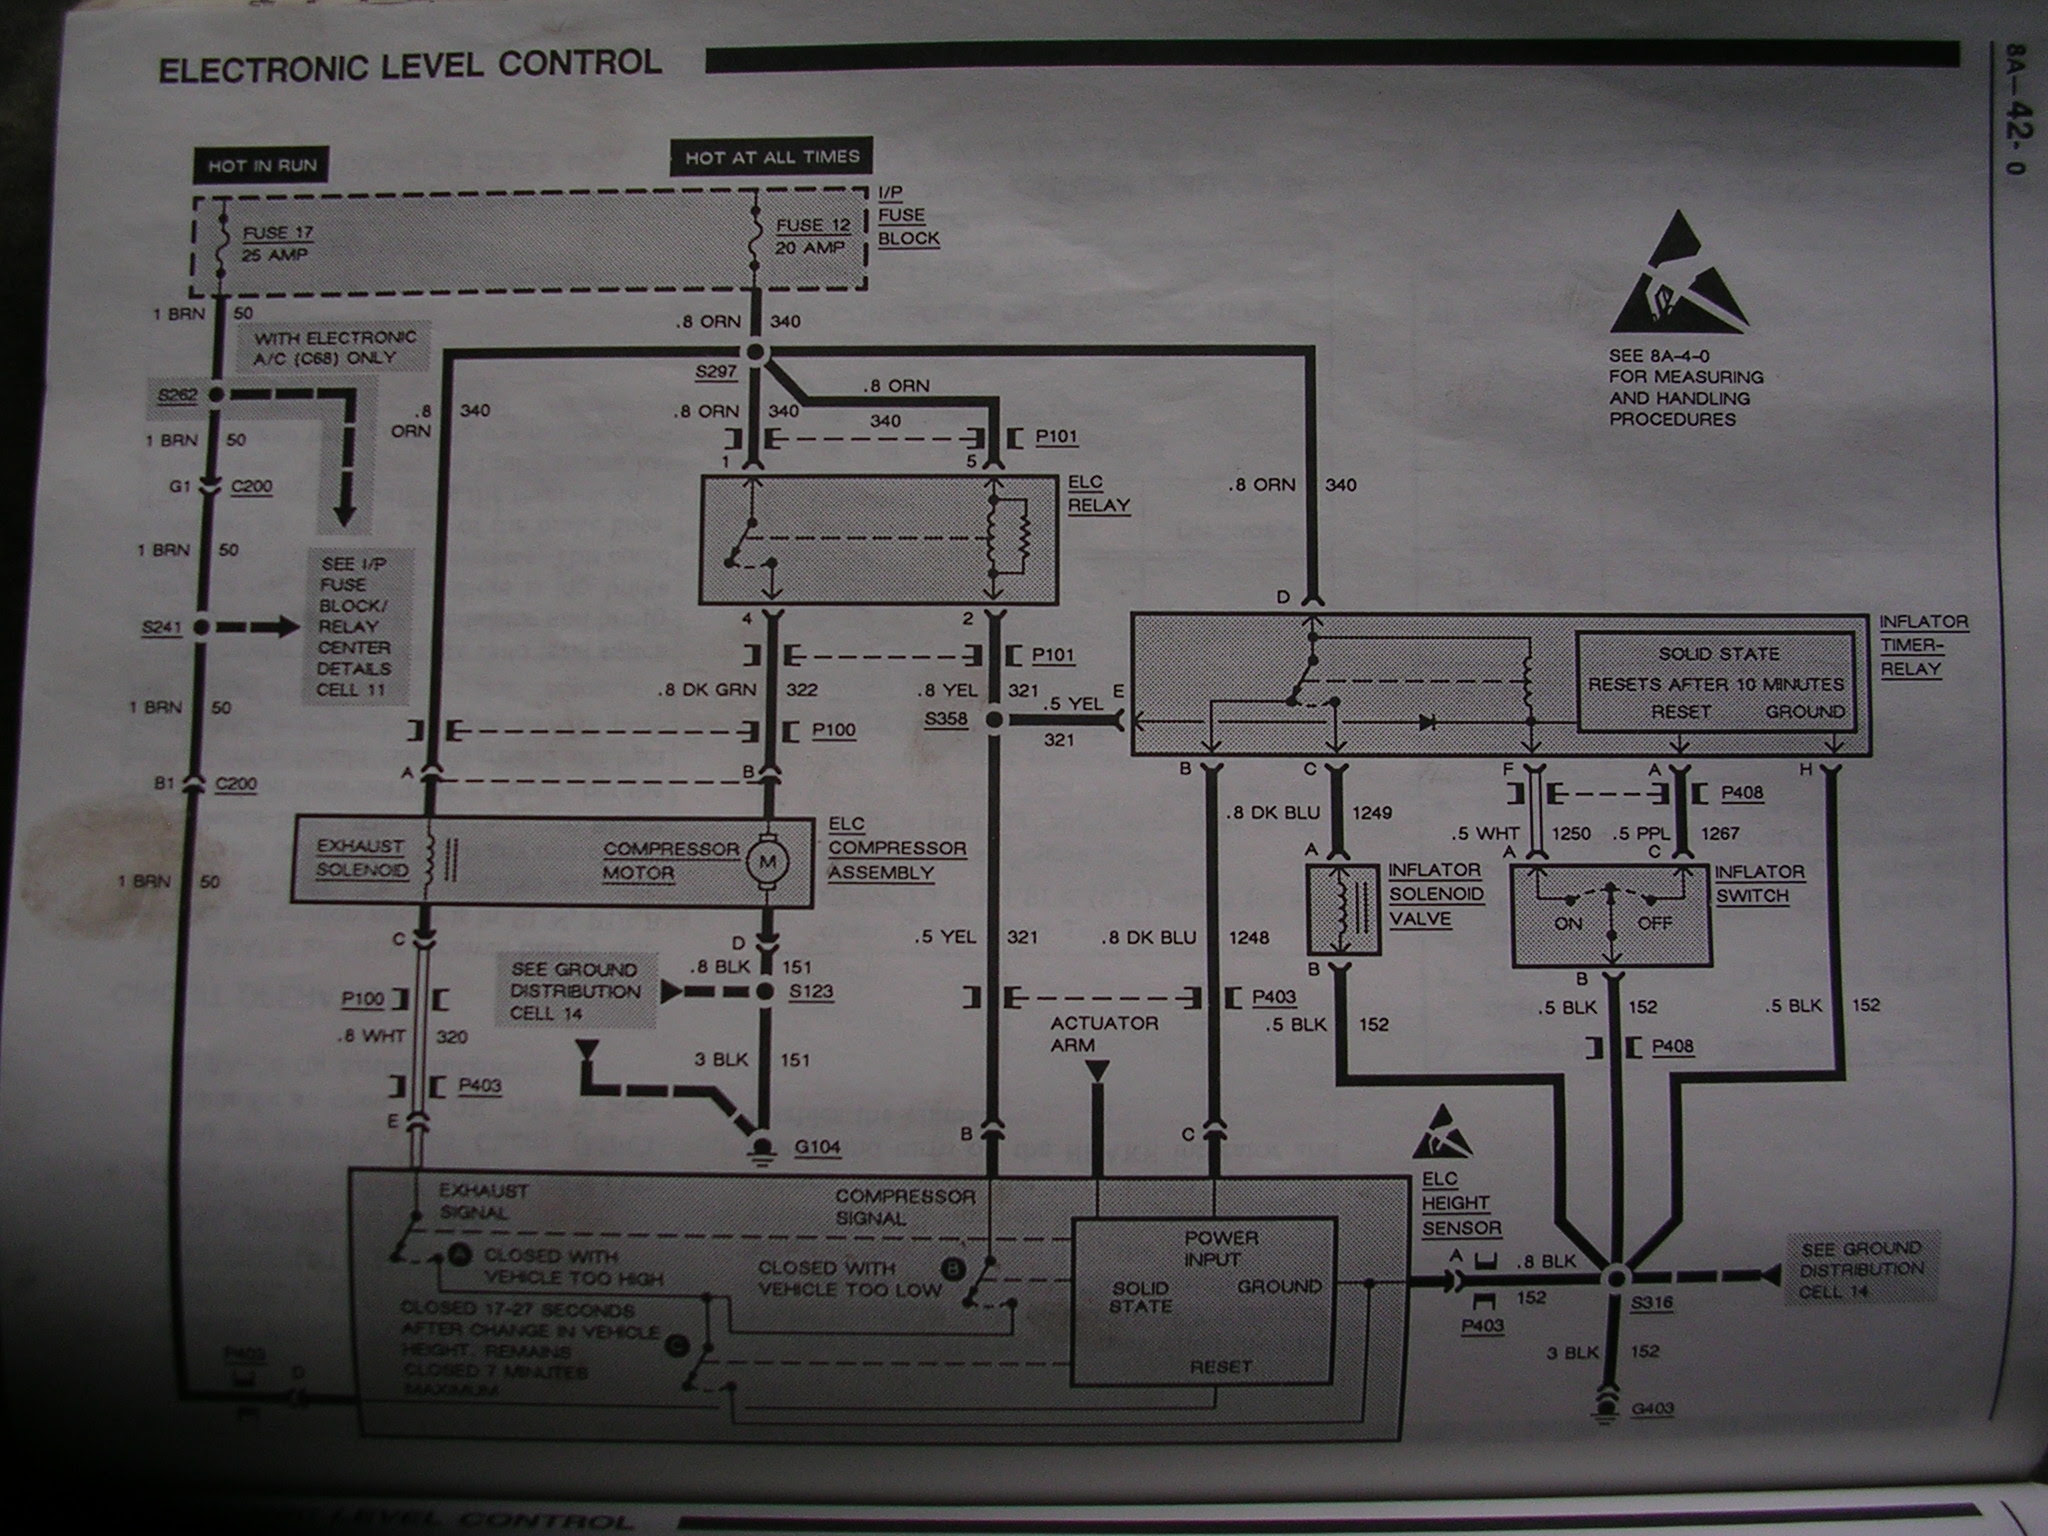 DIAGRAM] 92 Camaro Deck Lid Wiring Diagram FULL Version HD Quality Wiring  Diagram - ASMADIAGRAM.SHIA-LABEOUF.FRDiagram Database - Shia LaBeouf